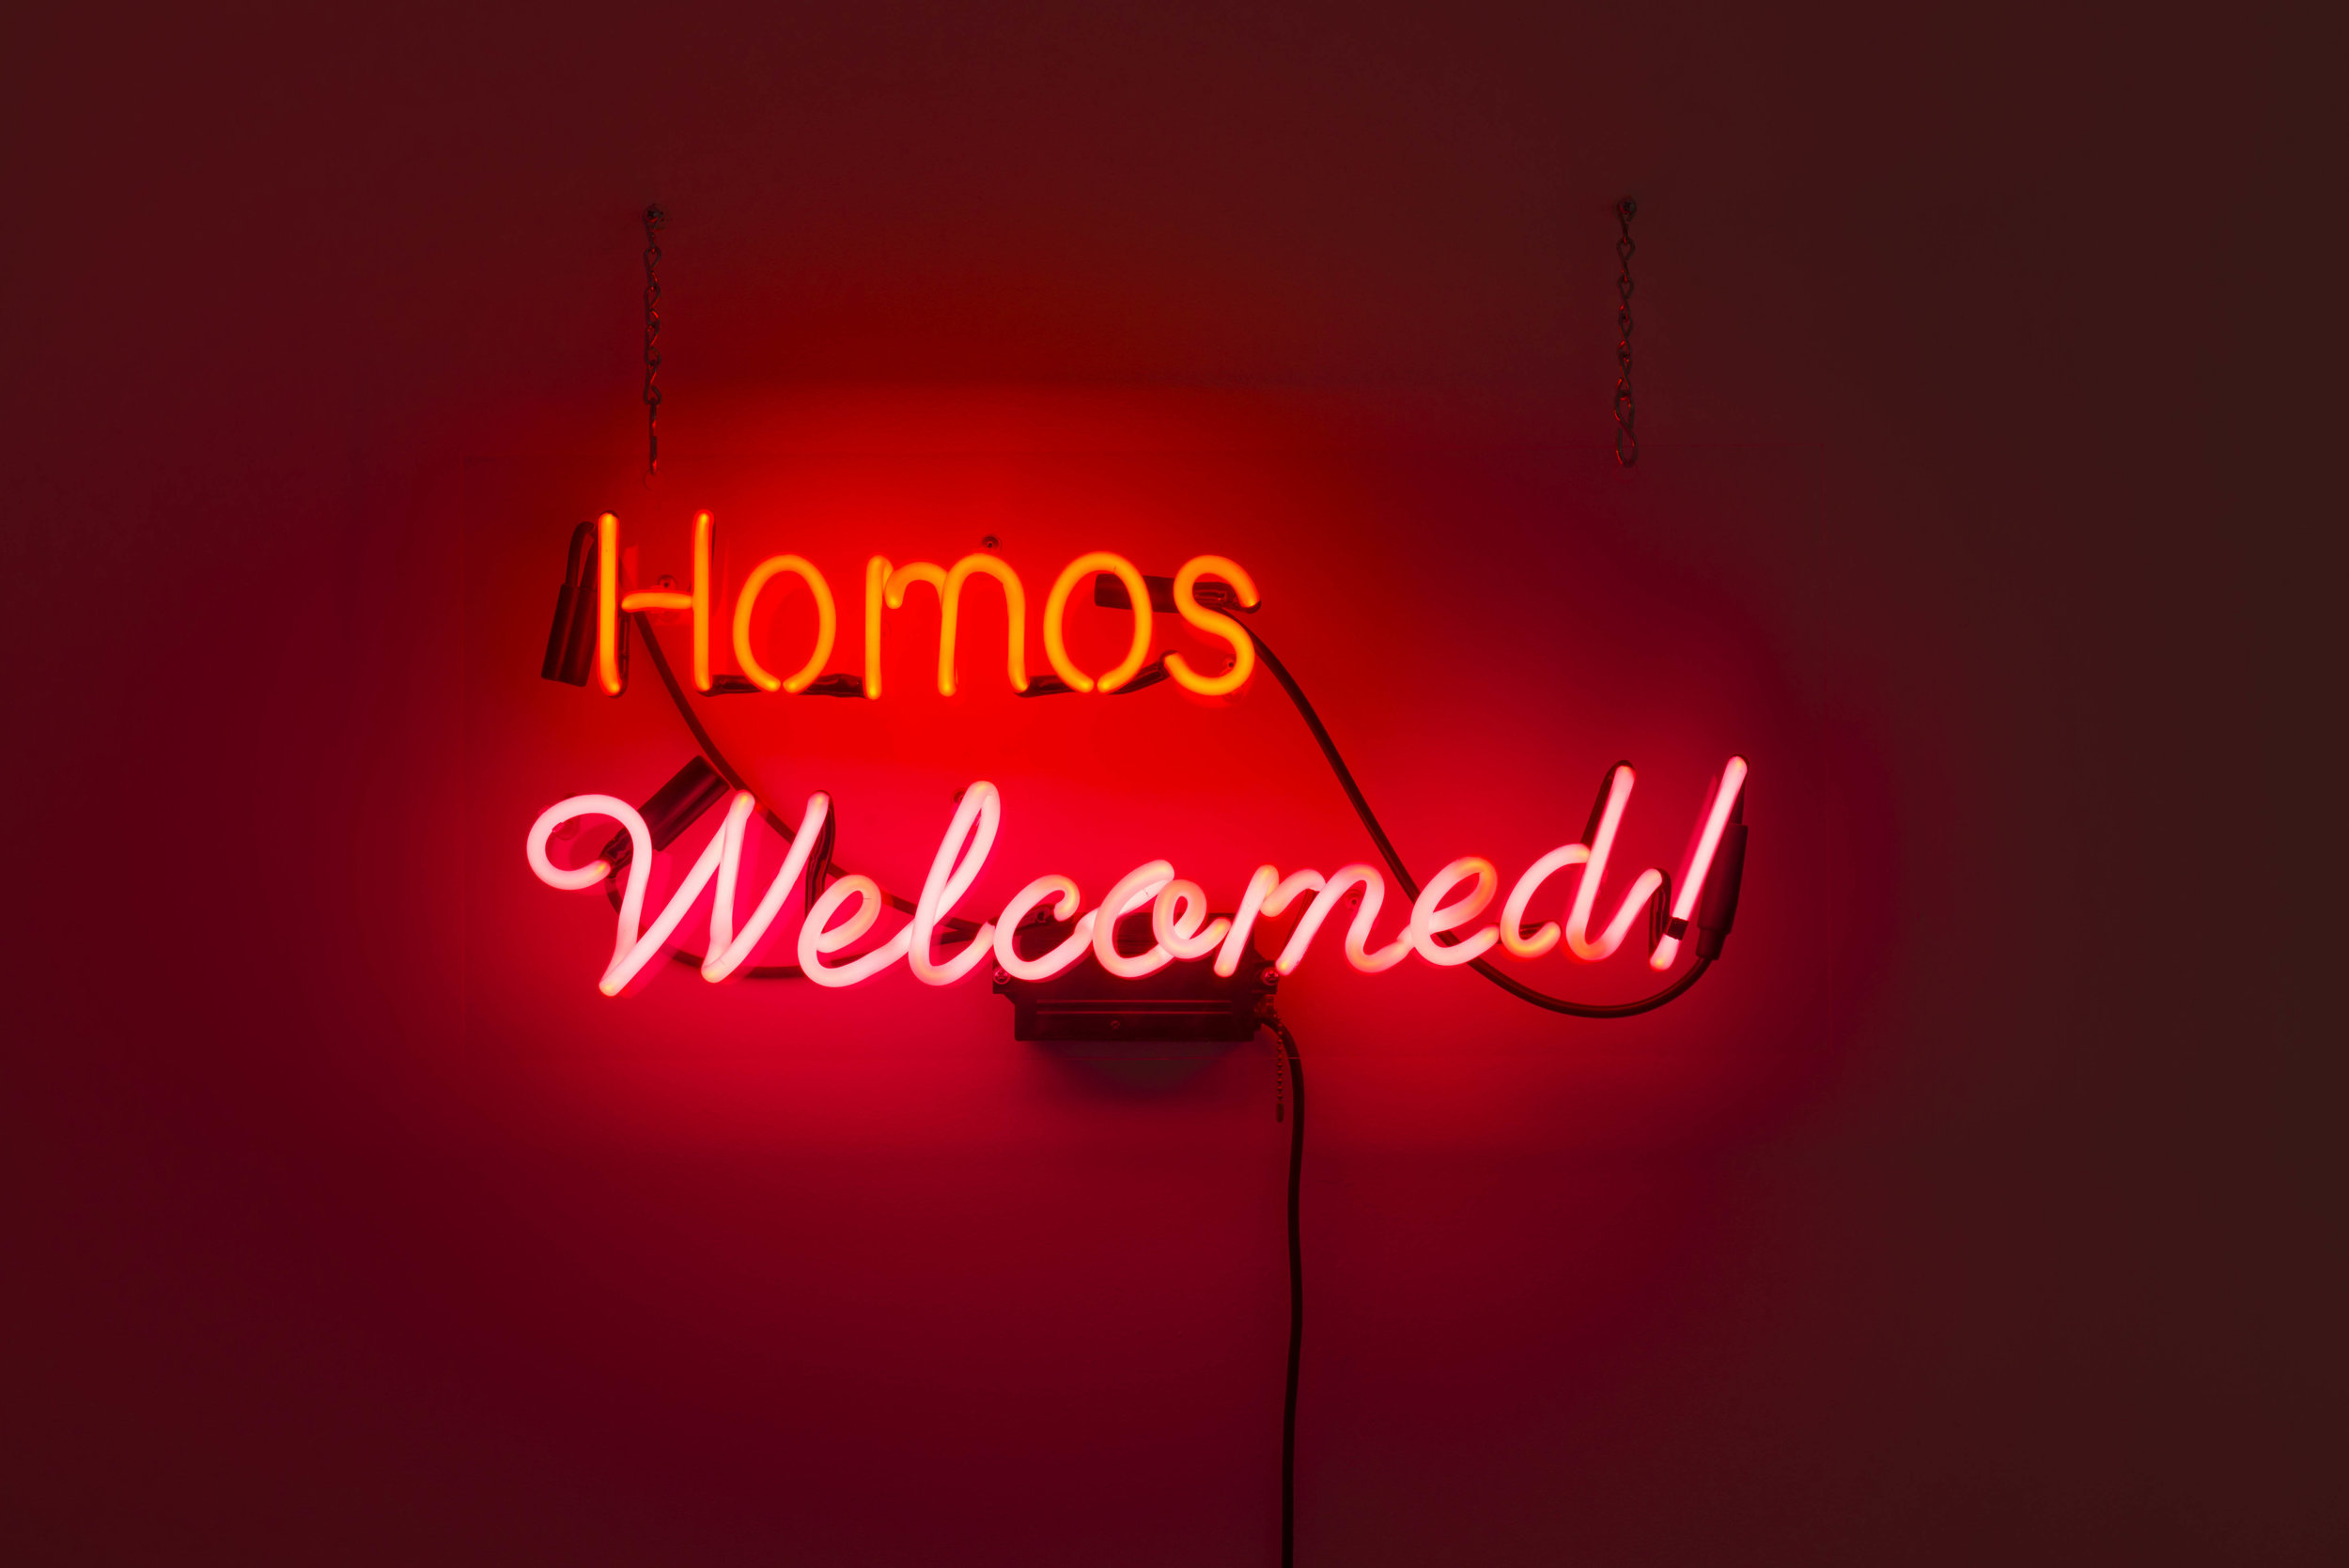 Alejandro Diaz  Homos Welcomed , 2009 neon on plexiglass 12 1/2 x 28 in (31.8 x 71.1 cm)